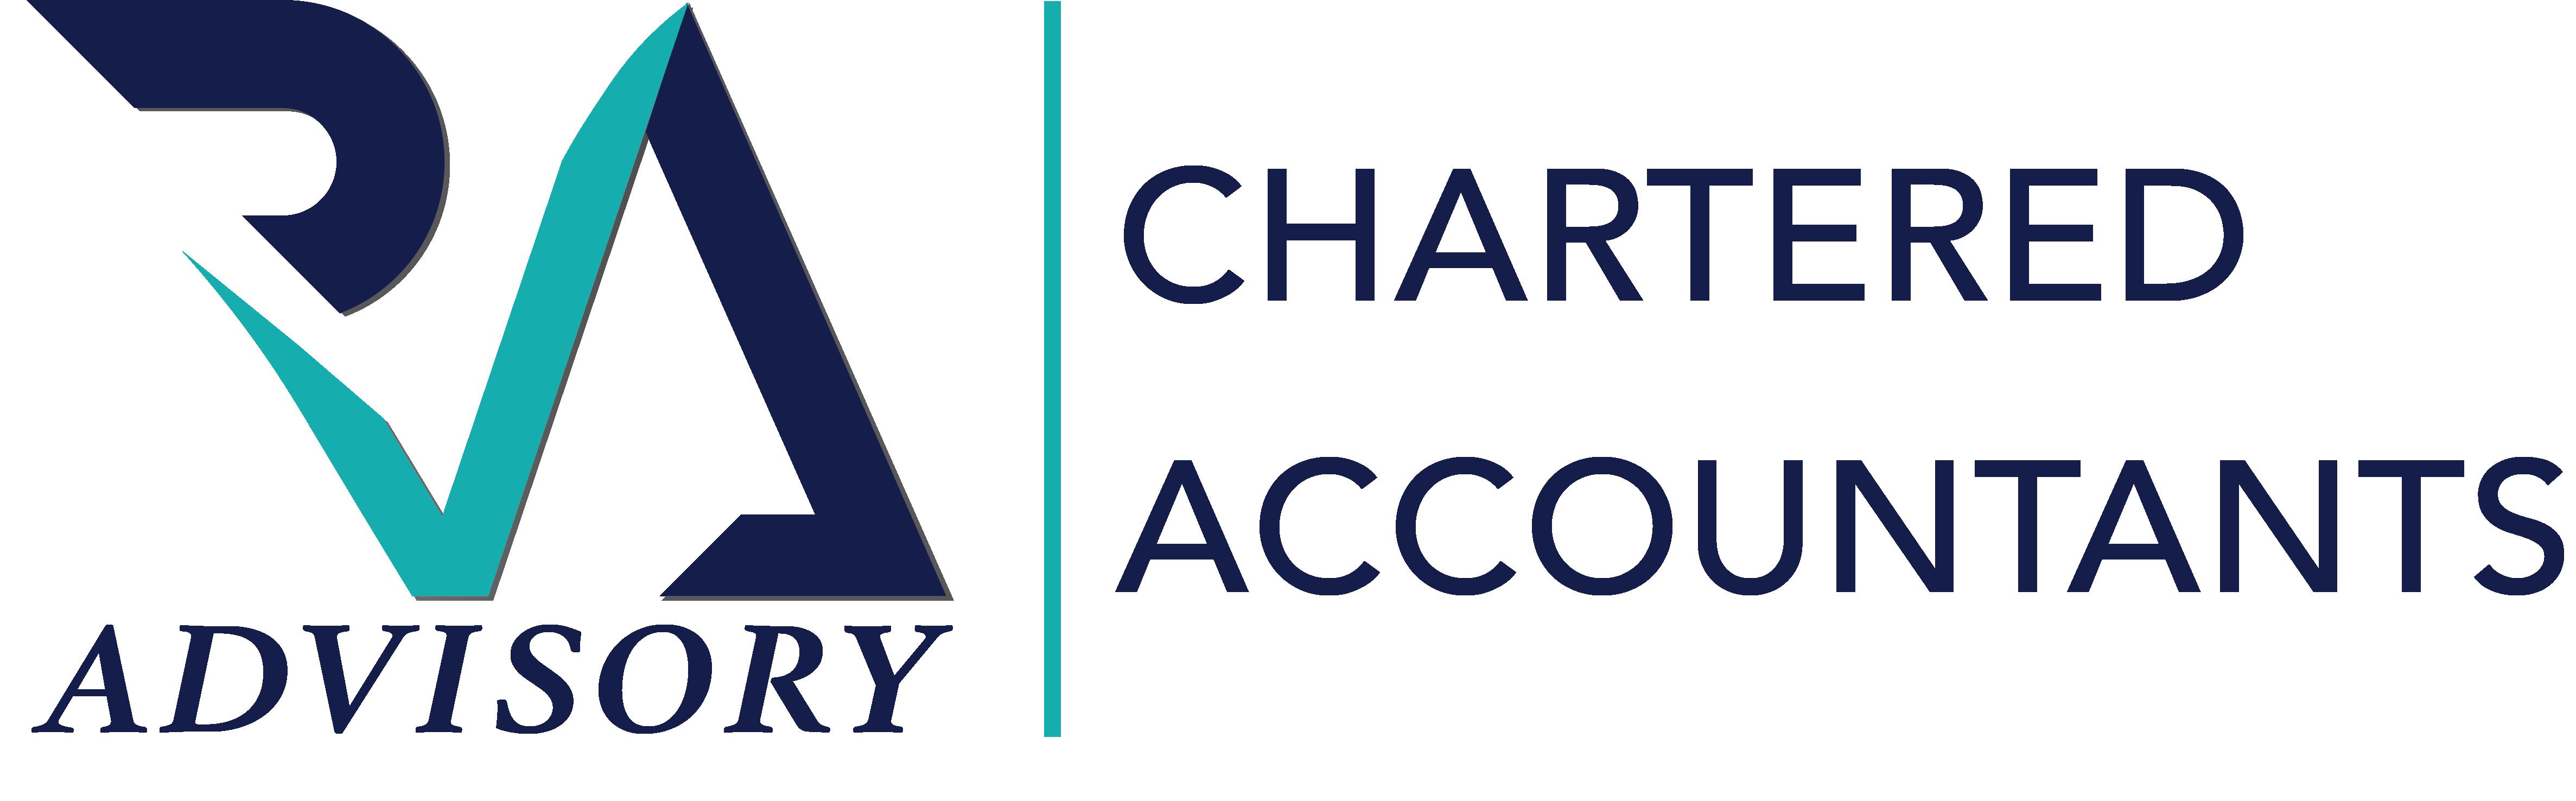 RA Advisory Business Accountants Logo